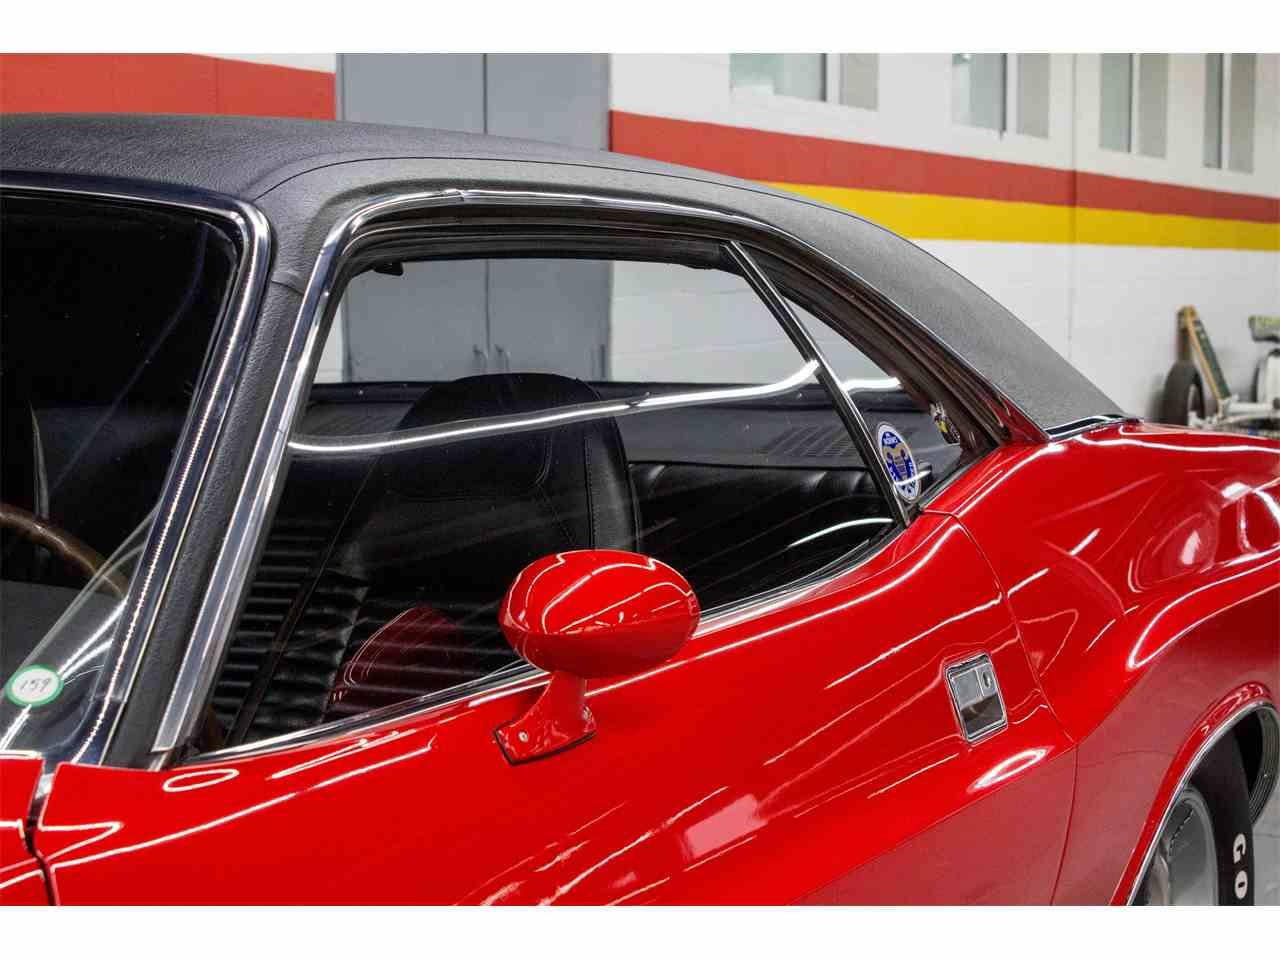 Gemütlich Dodge 7 Pin Stecker Schaltplan Ideen - Schaltplan Serie ...